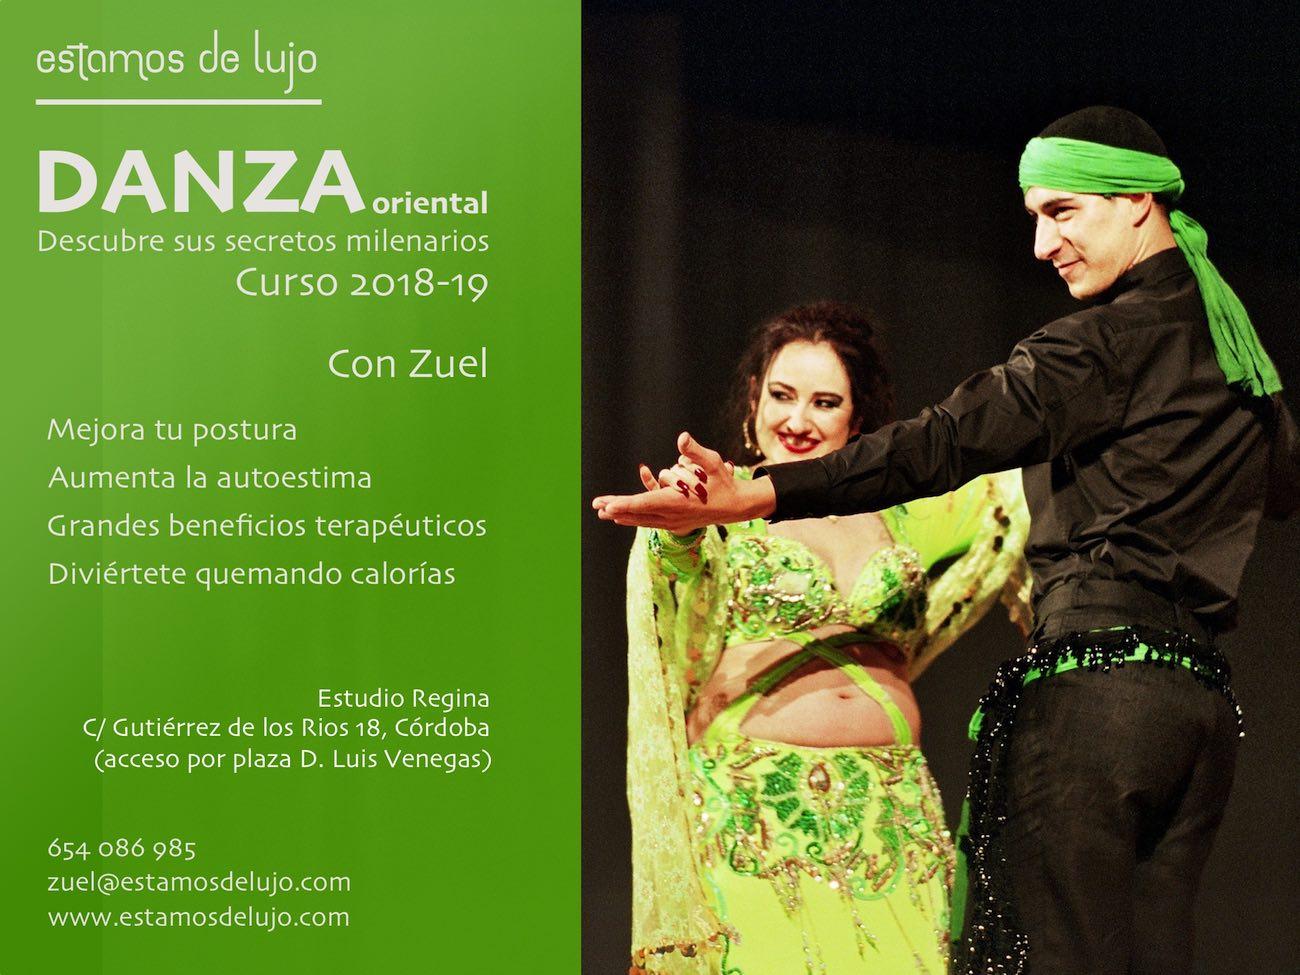 Clases danza oriental Córdoba 2018 19